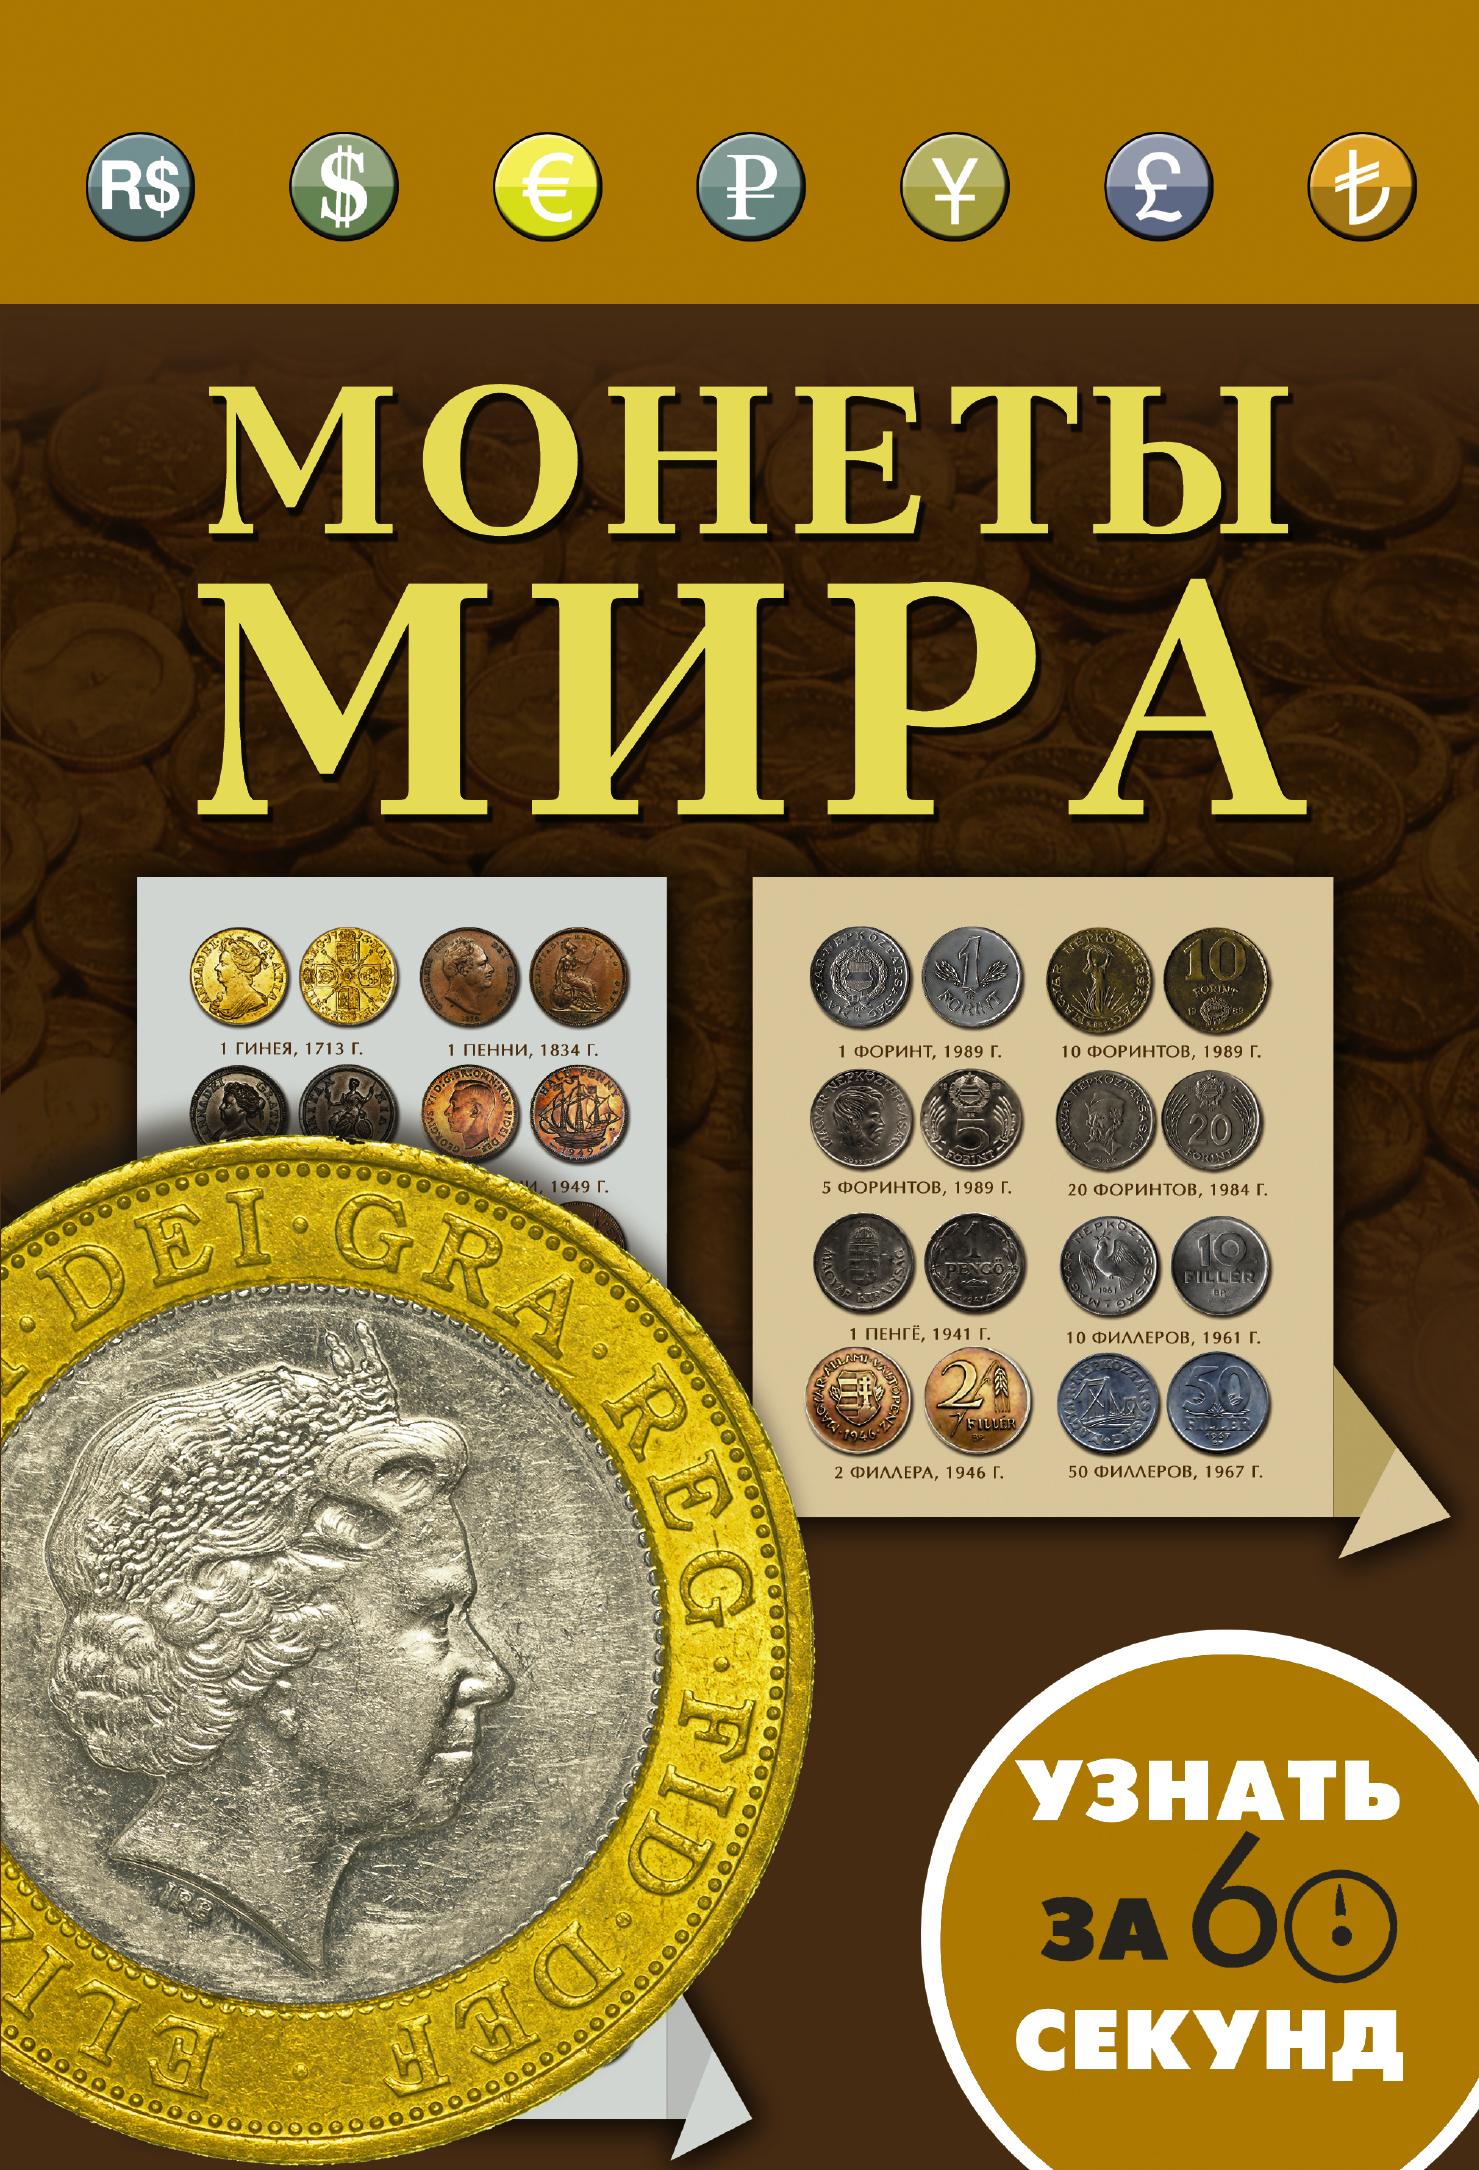 . Монеты мира монеты в сургуте я продаю